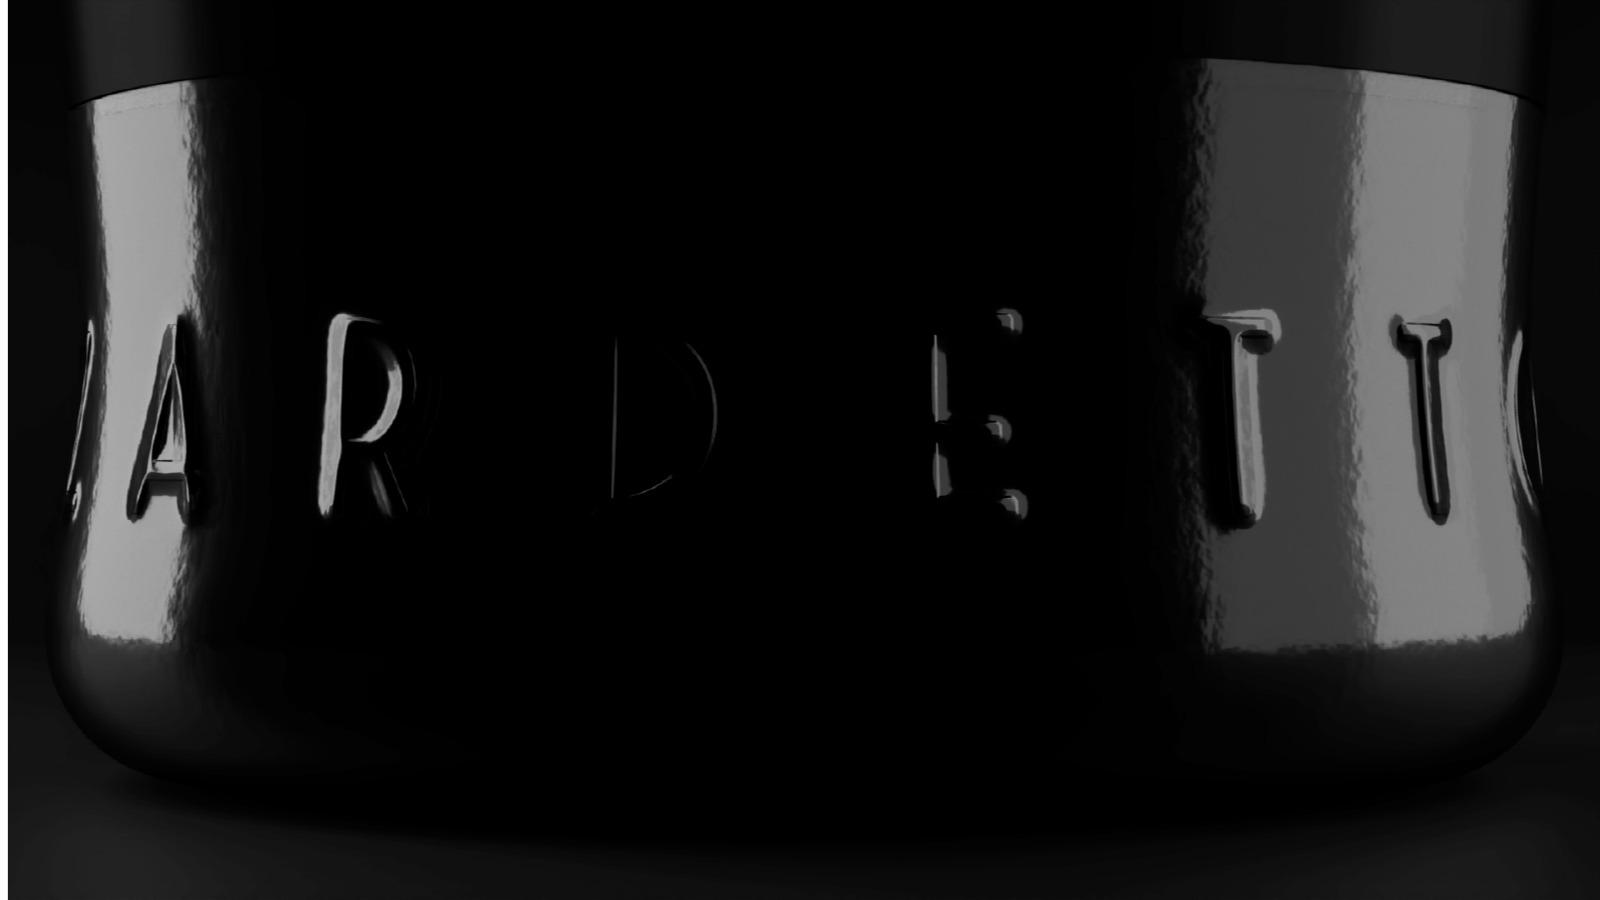 reflection of light on a Zardetto's bottle